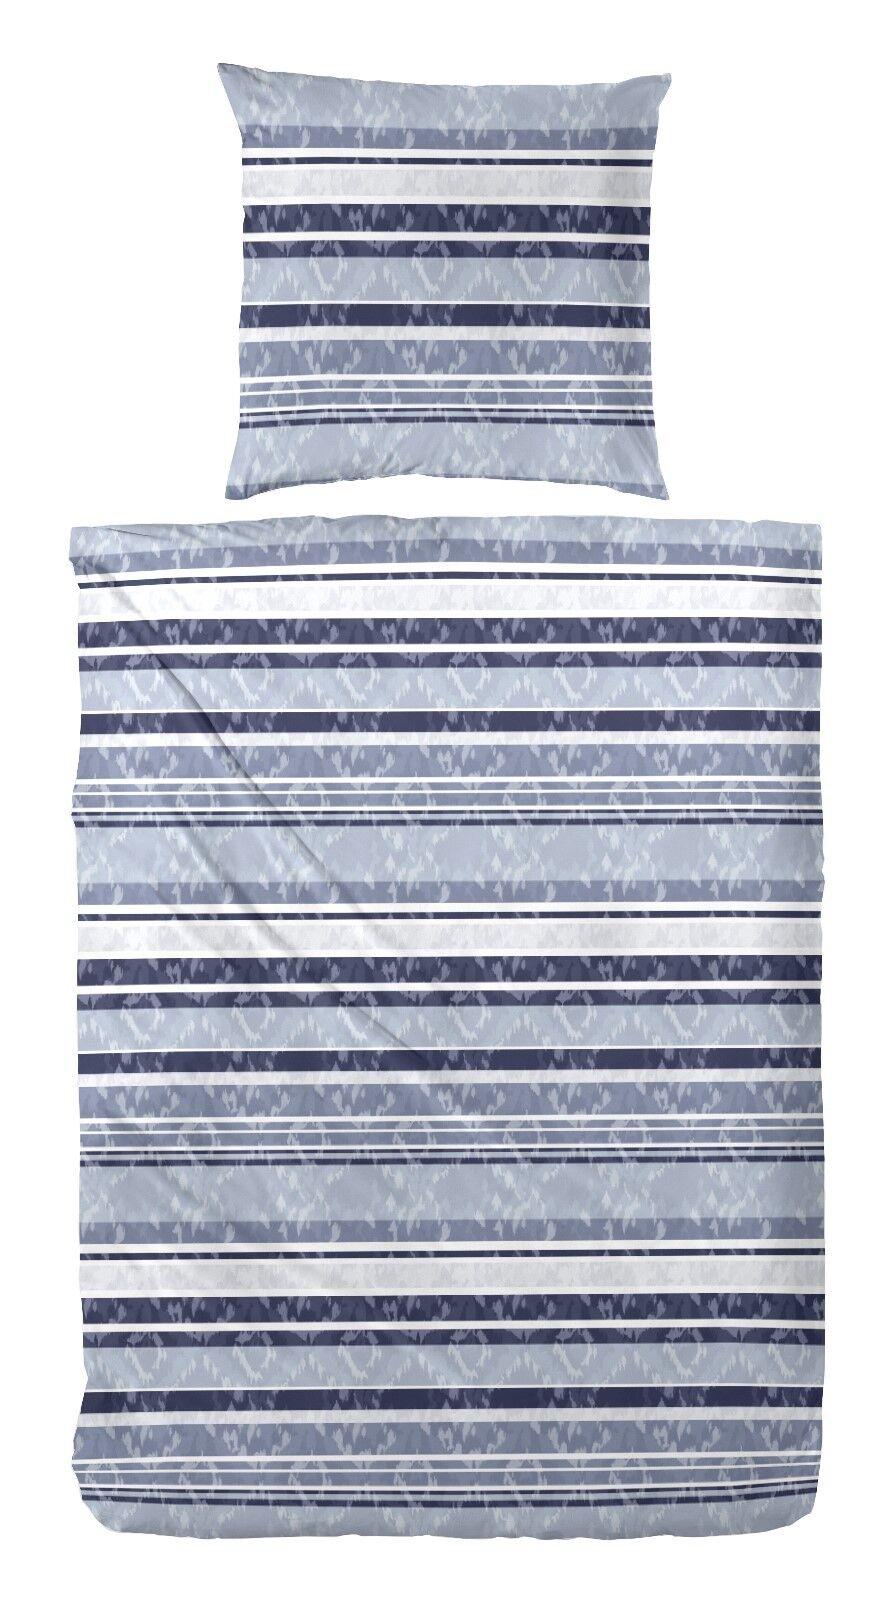 4 tlg. Biber Bettwäsche Streifen blau aqua 2x80x80+155x220 cm  172109 033B04